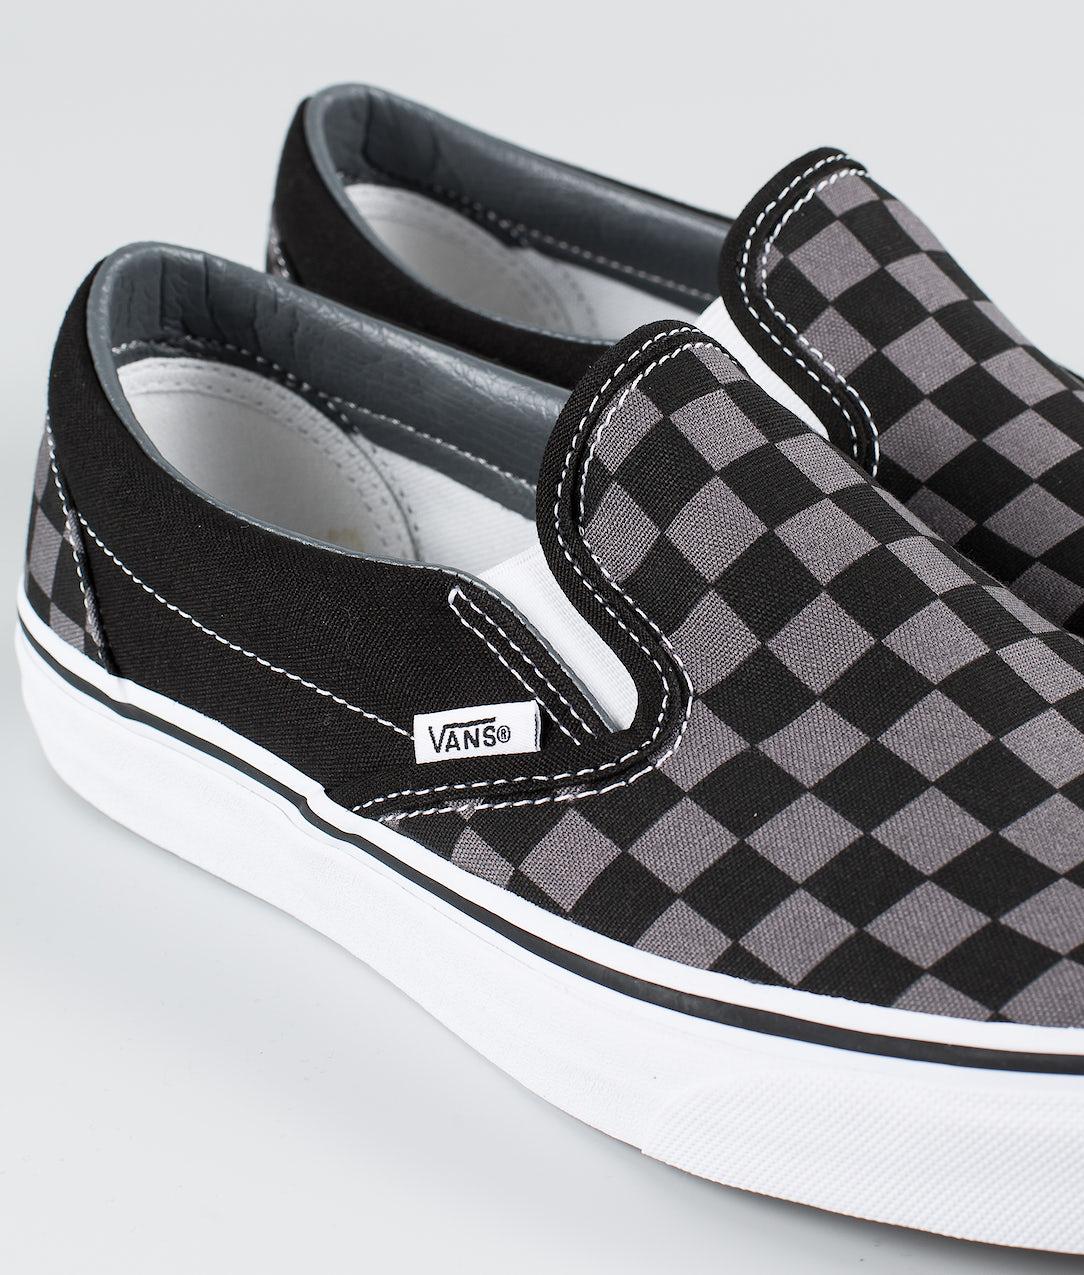 the latest 4e2c0 10284 Vans Classic Slip-On Scarpe Black/Pewter Checkerboard